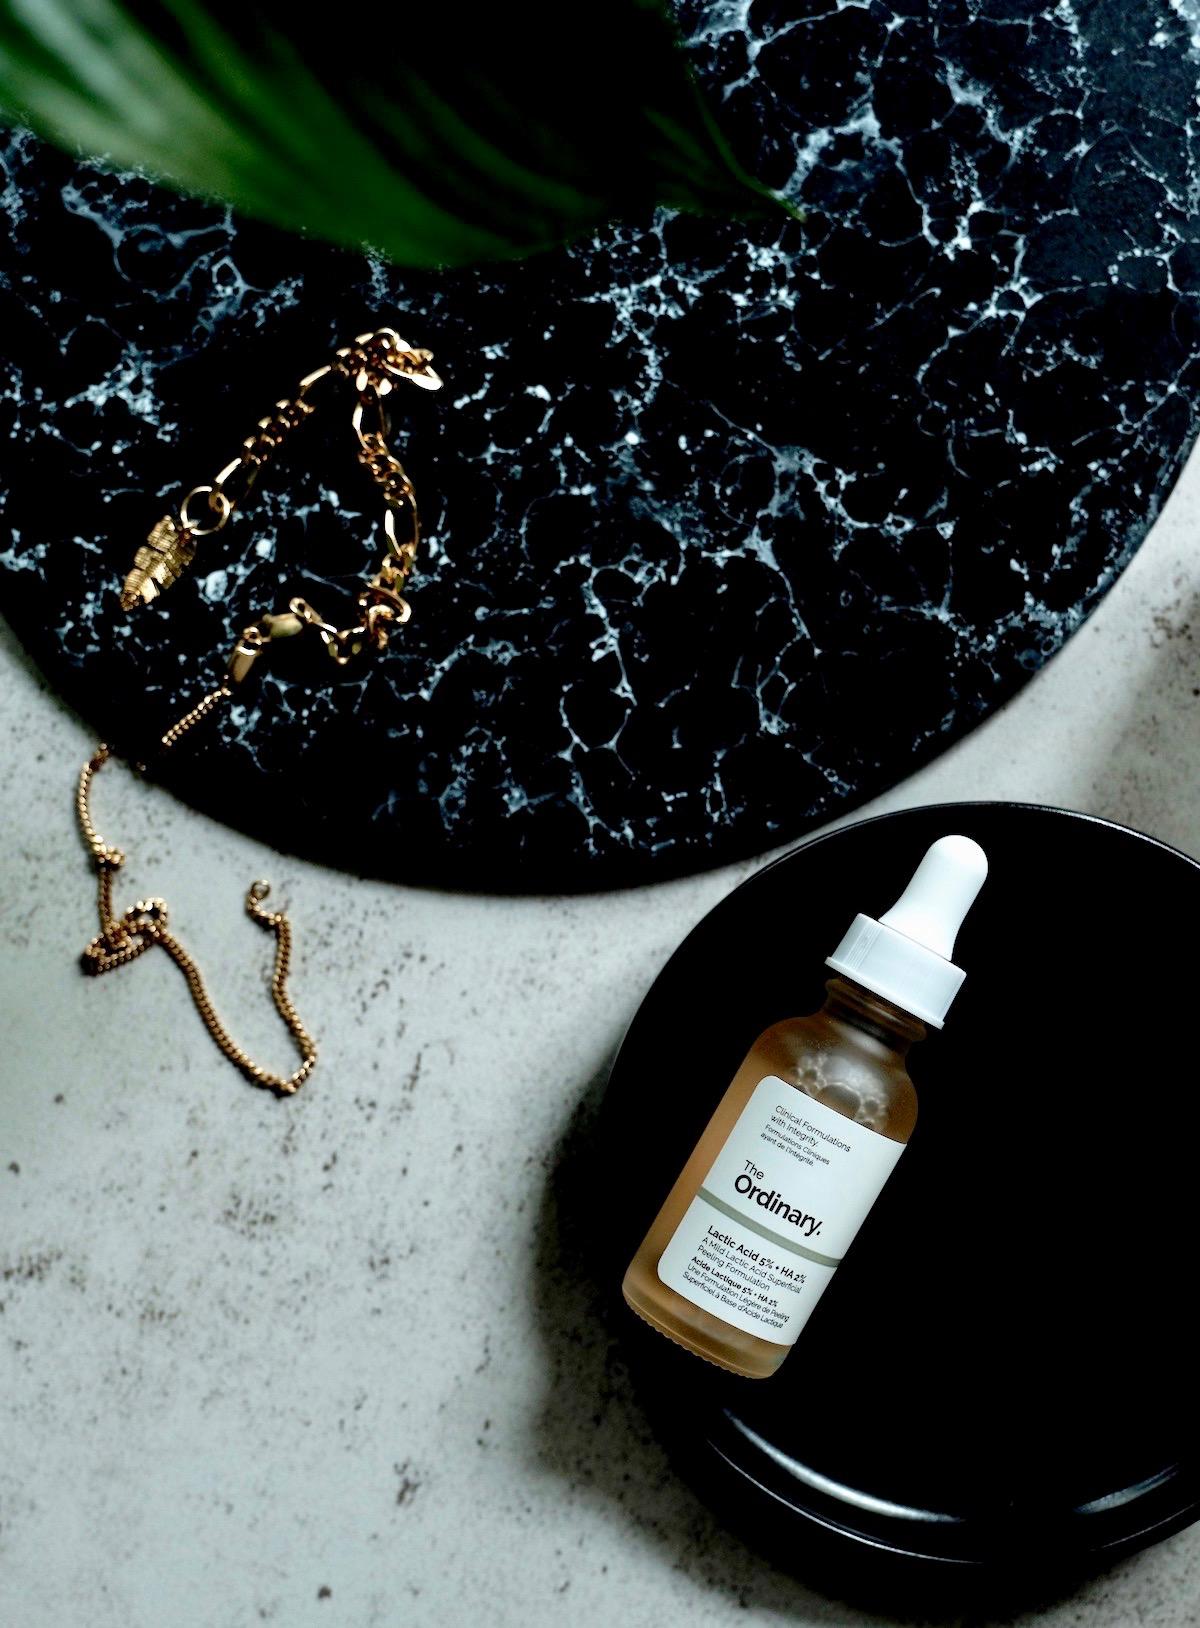 Beautyblog Beautyblogger BARE MINDS Elina Neumann SOS Pickel Peeling The Ordinary Lactic Acid 2